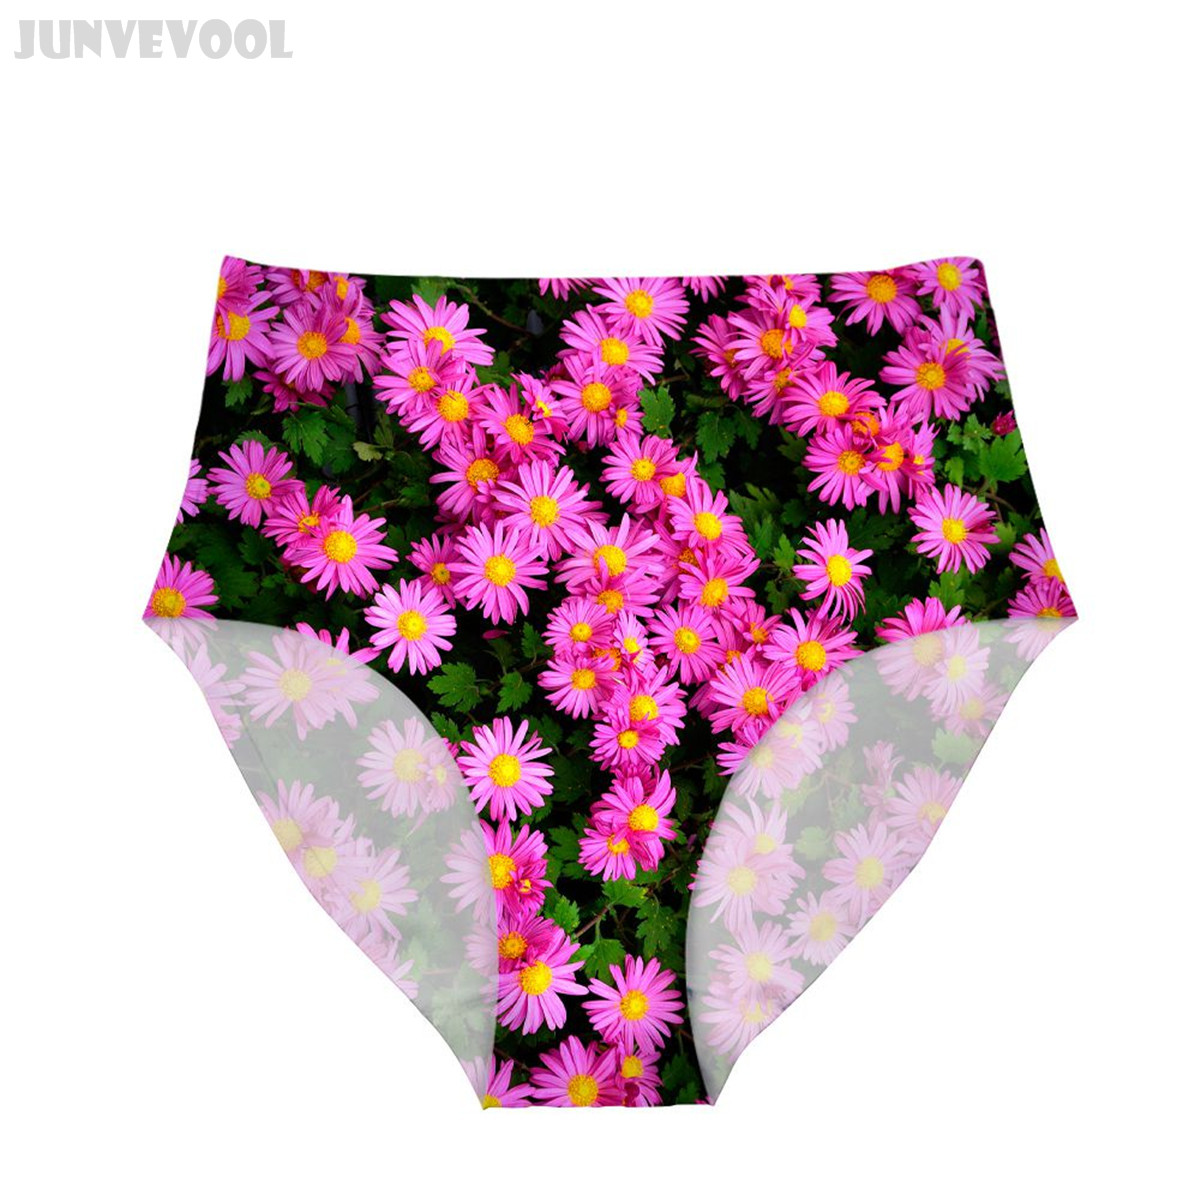 fd0fb81f92 Lingerie High Waist Panties Flower New Women Underwear High Cut Floral  Print Panties Shapewear Brief Body Shaper 3D Plants Pants-in women s panties  from ...